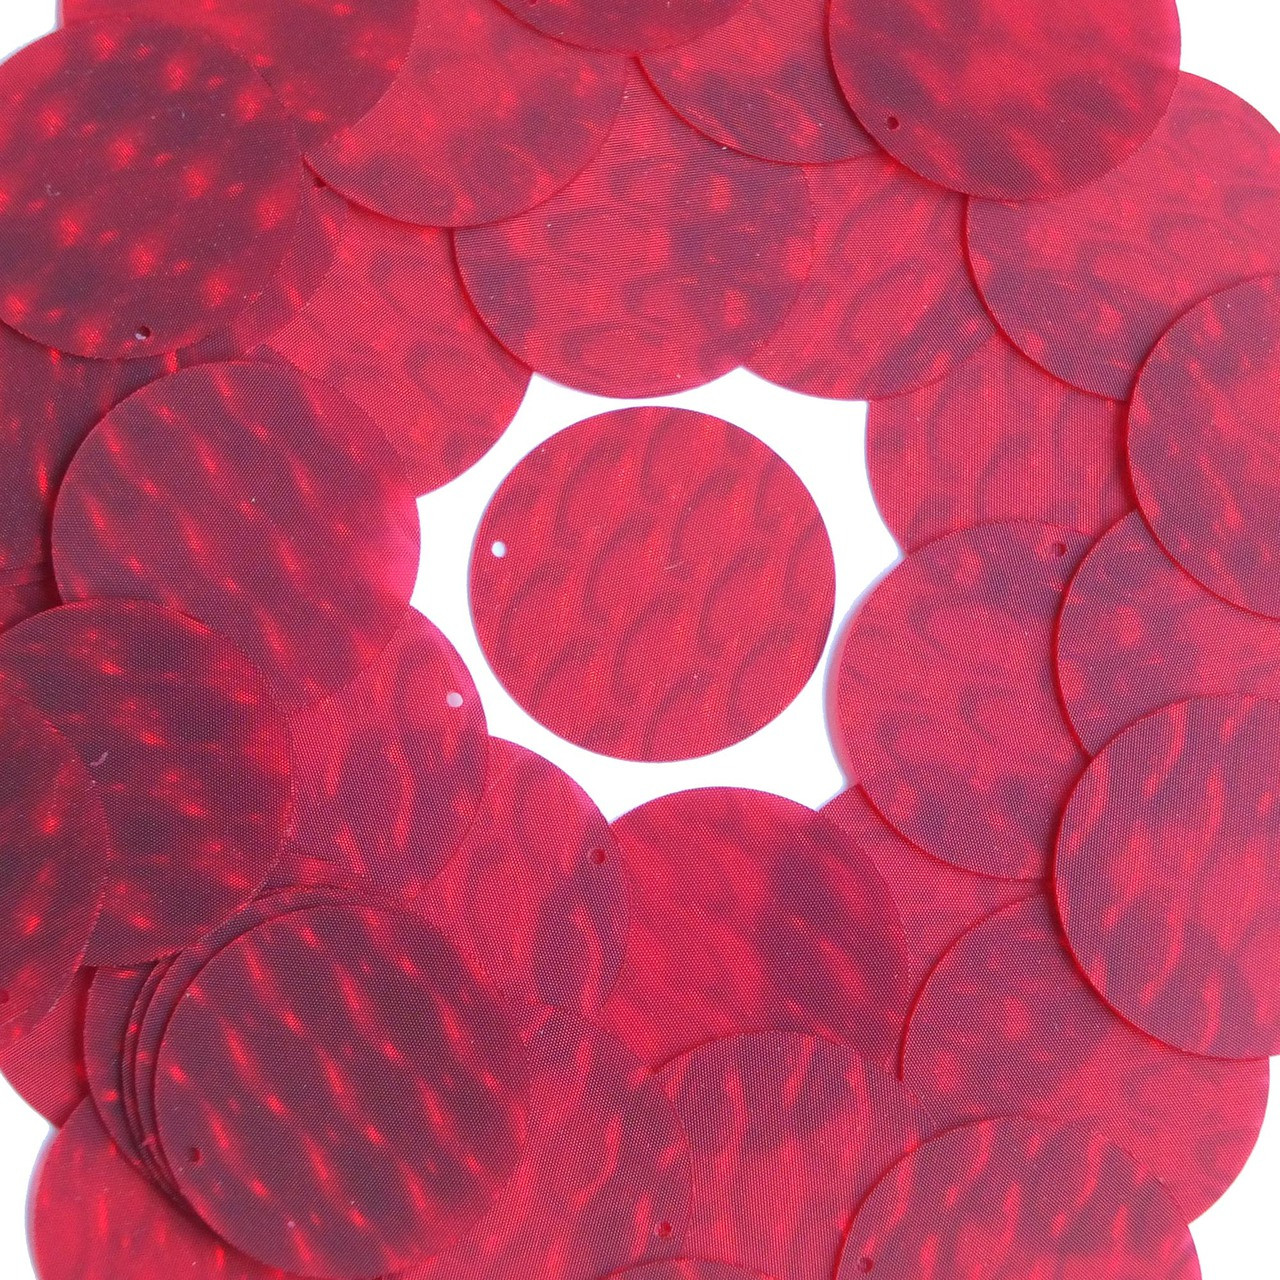 3d Red Reflectors : Mm sequins red d dimensional reflector sequinsusa